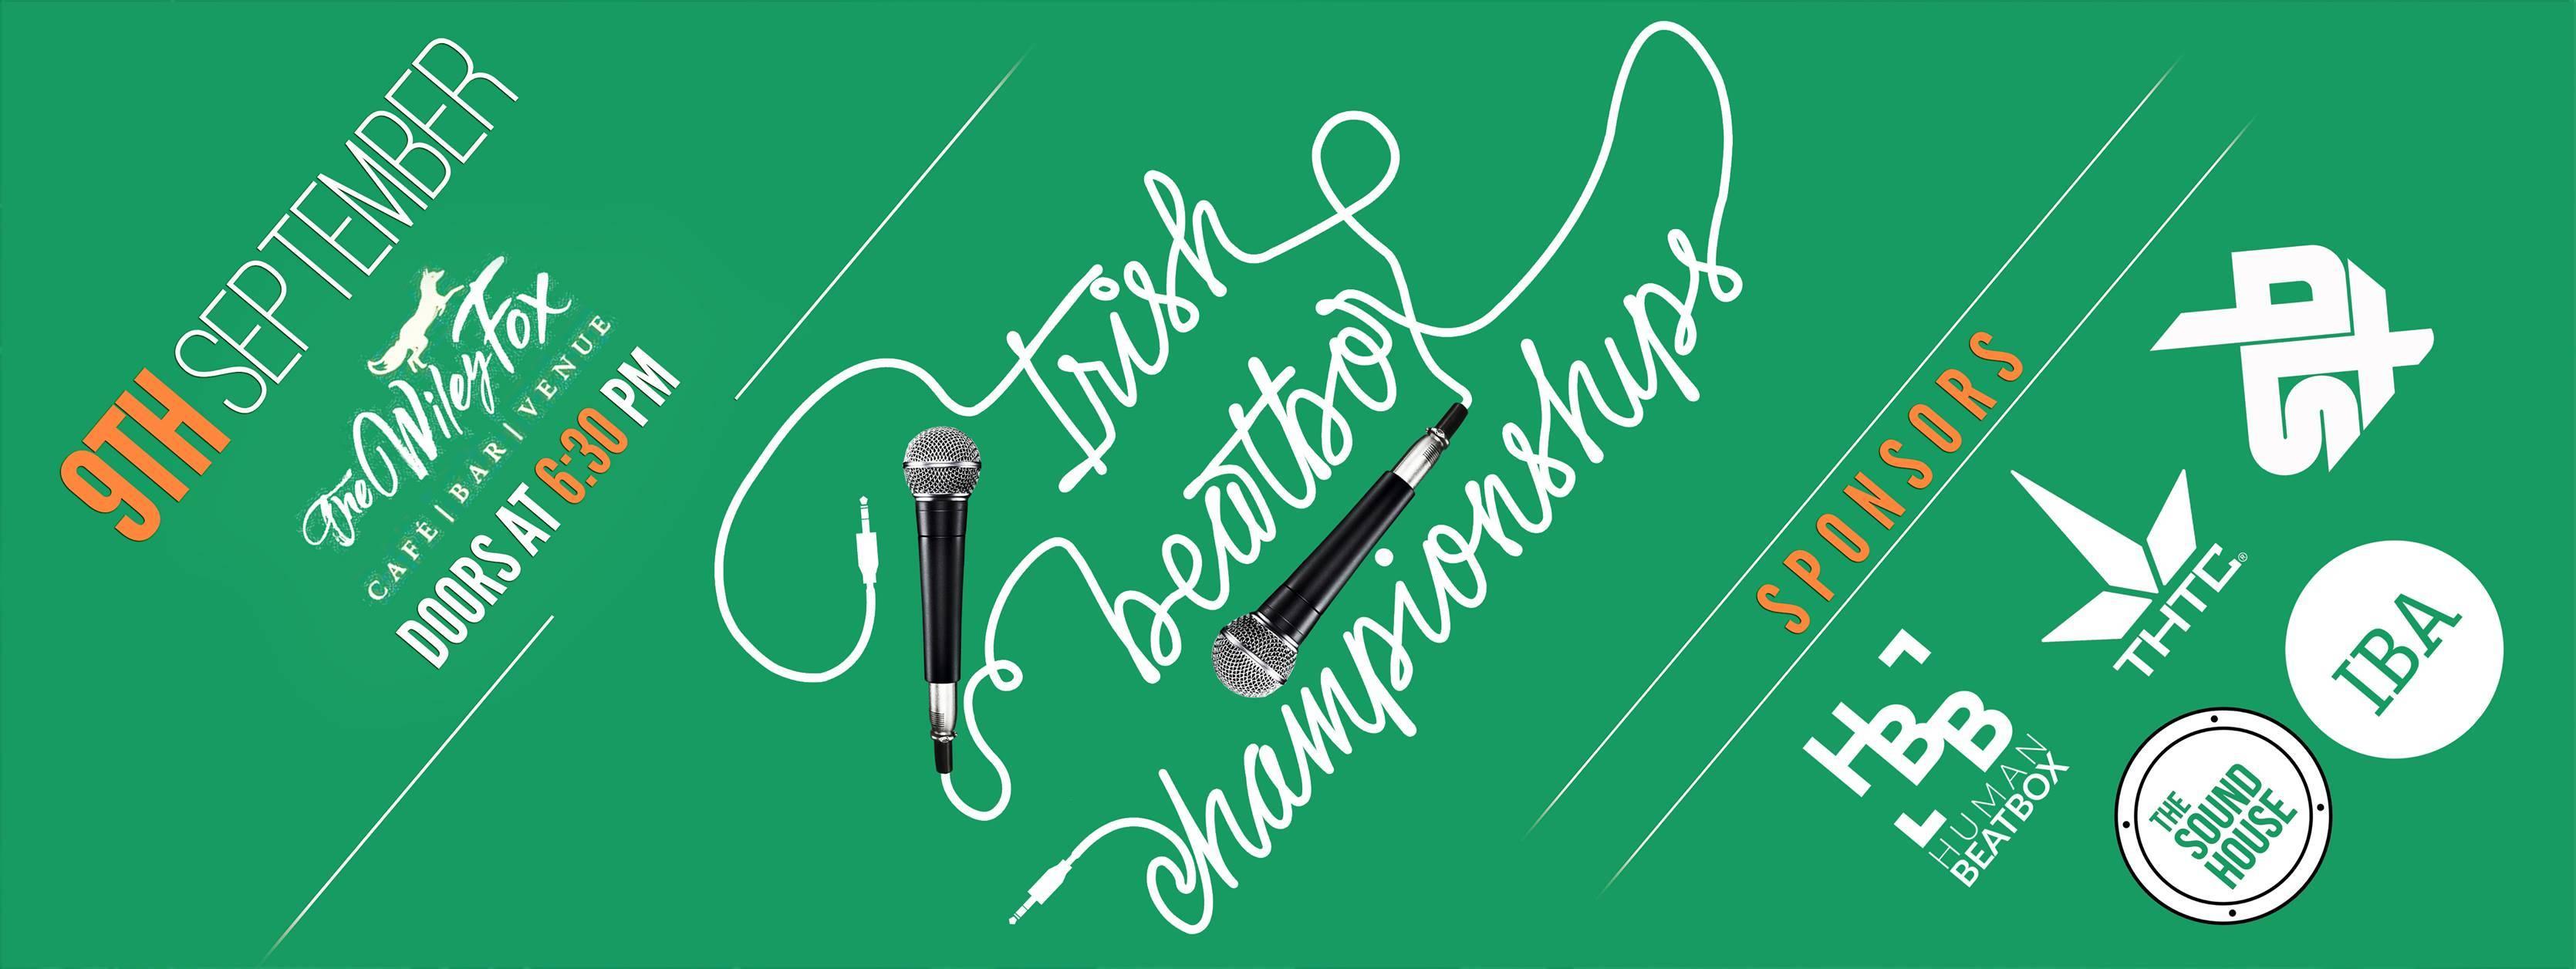 Ireland Beatbox Championship 2016